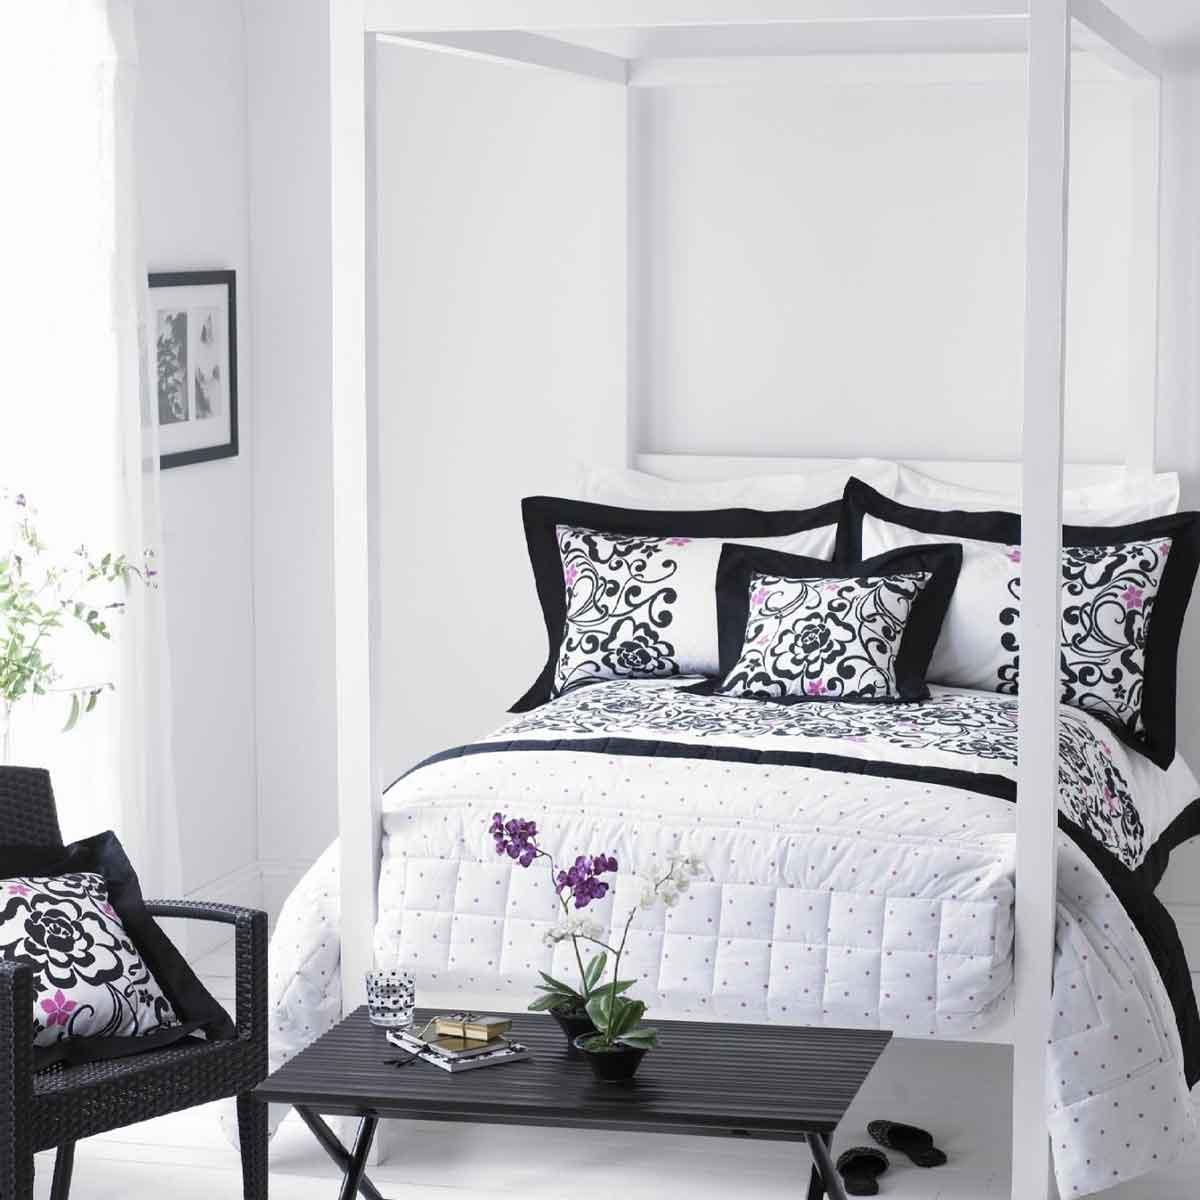 black white gray bedroom design photo - 3